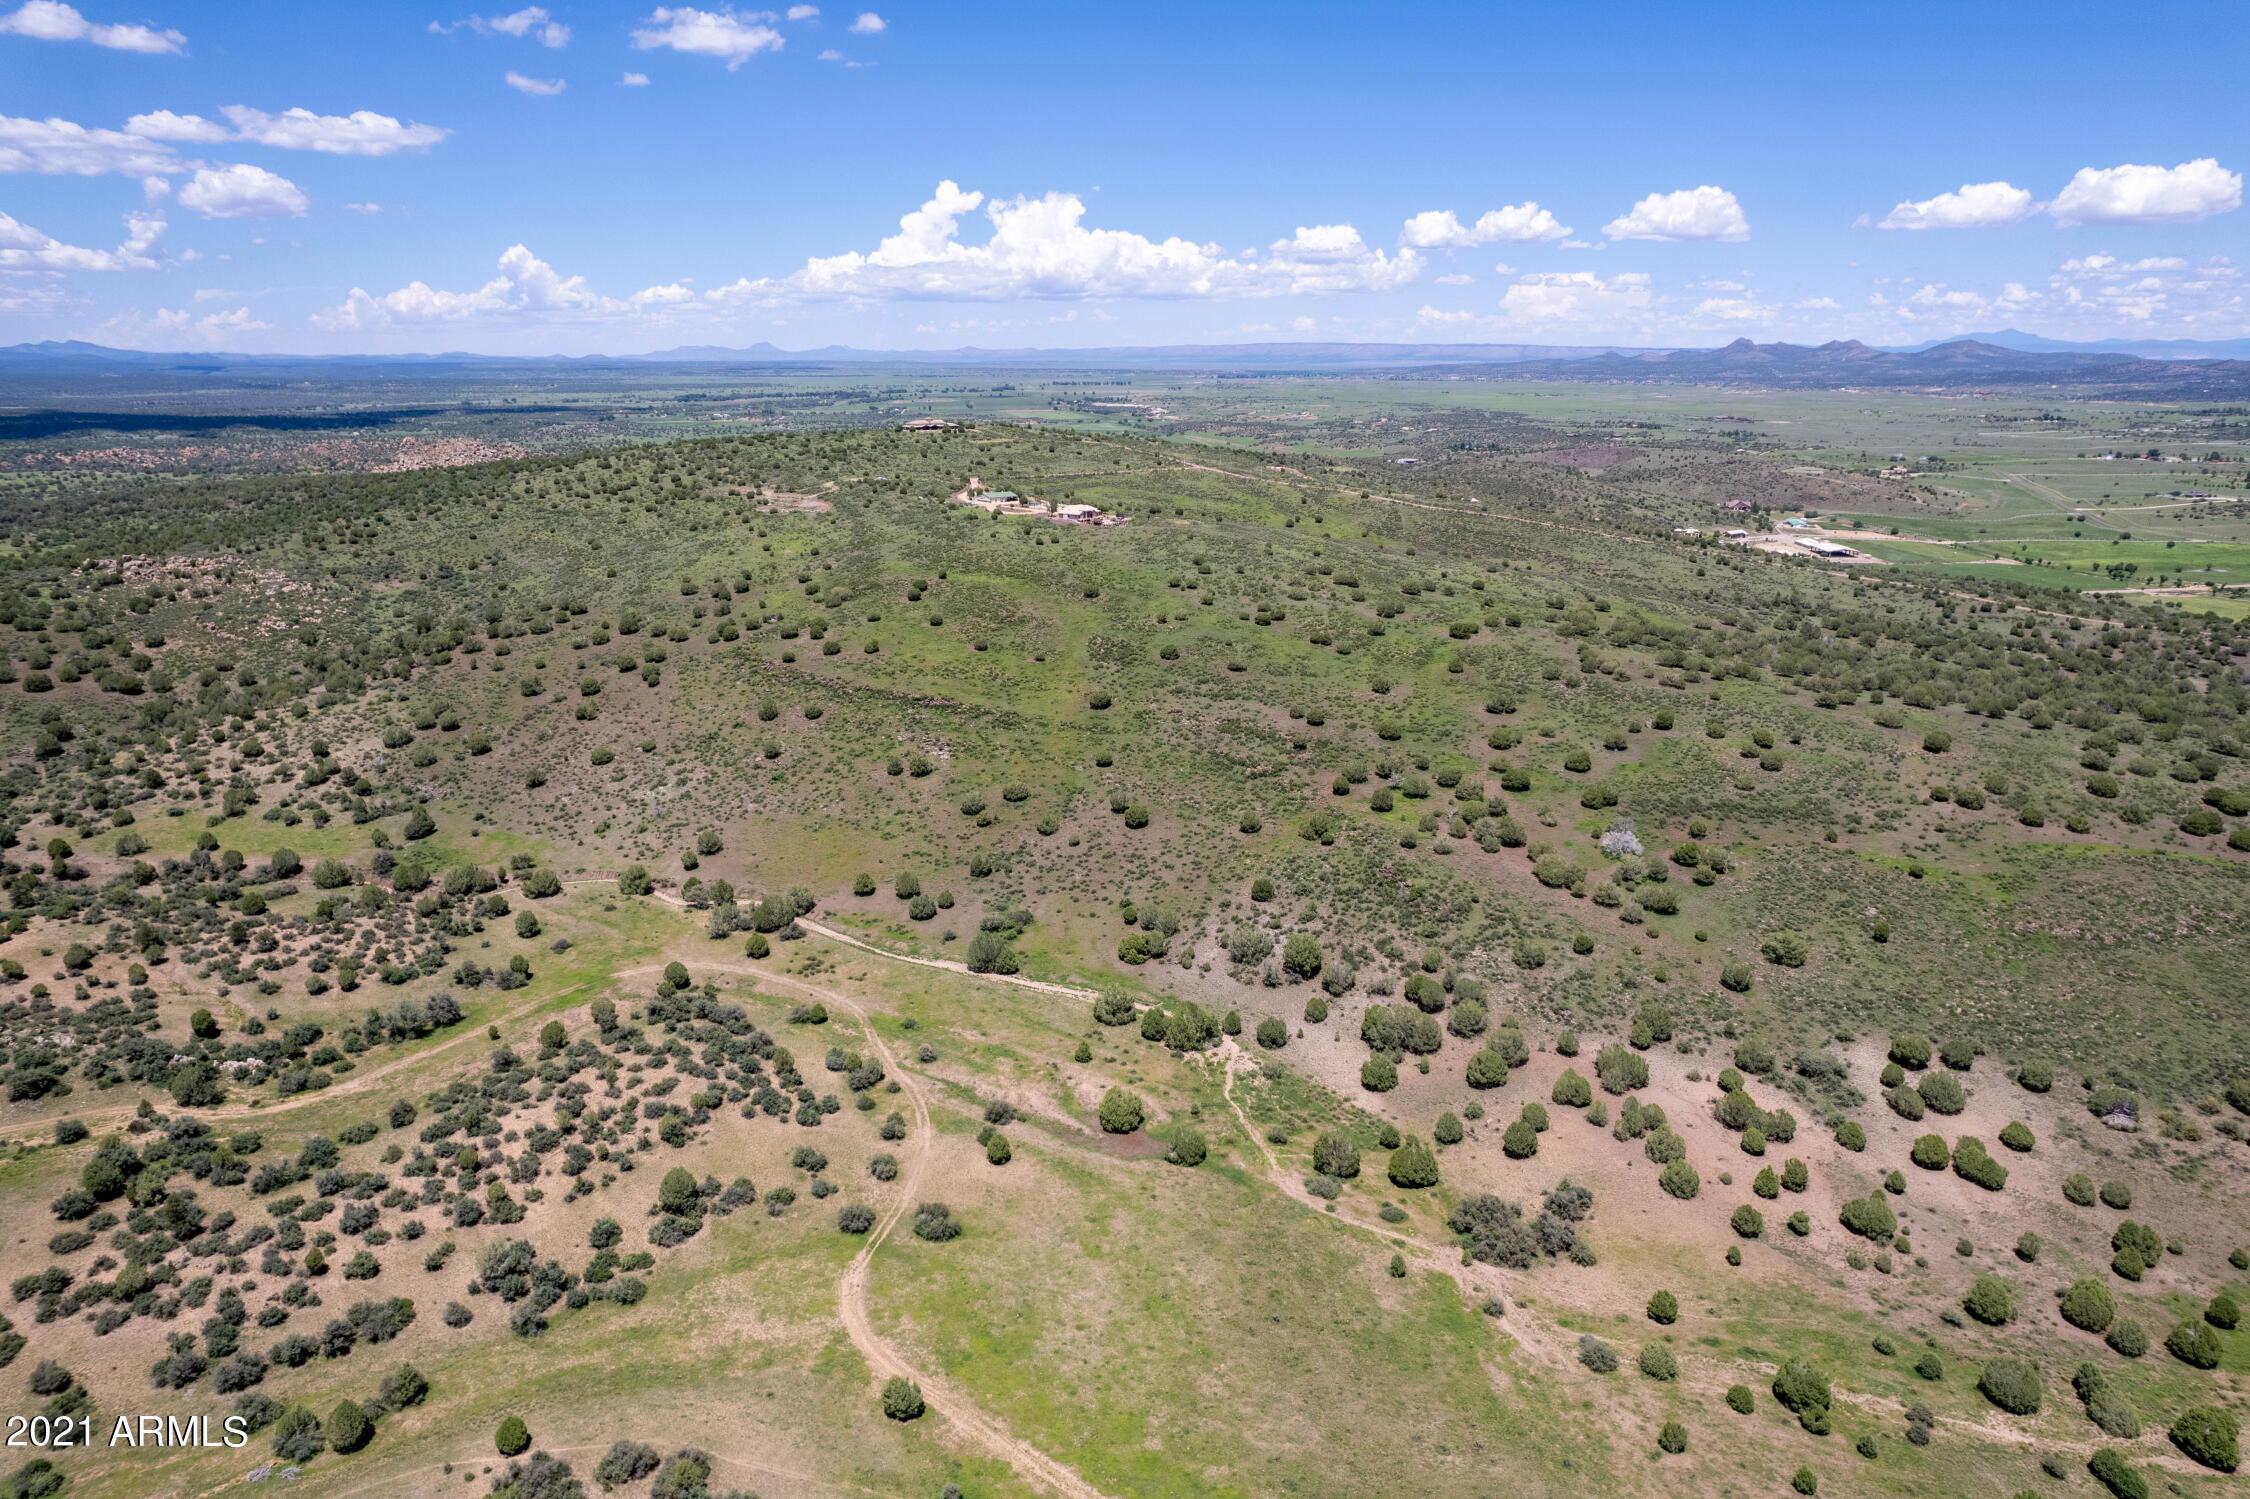 12080 N Buckbrush Circle # 28, Prescott, AZ 86305, ,Land,For Sale,12080 N Buckbrush Circle # 28,6074299